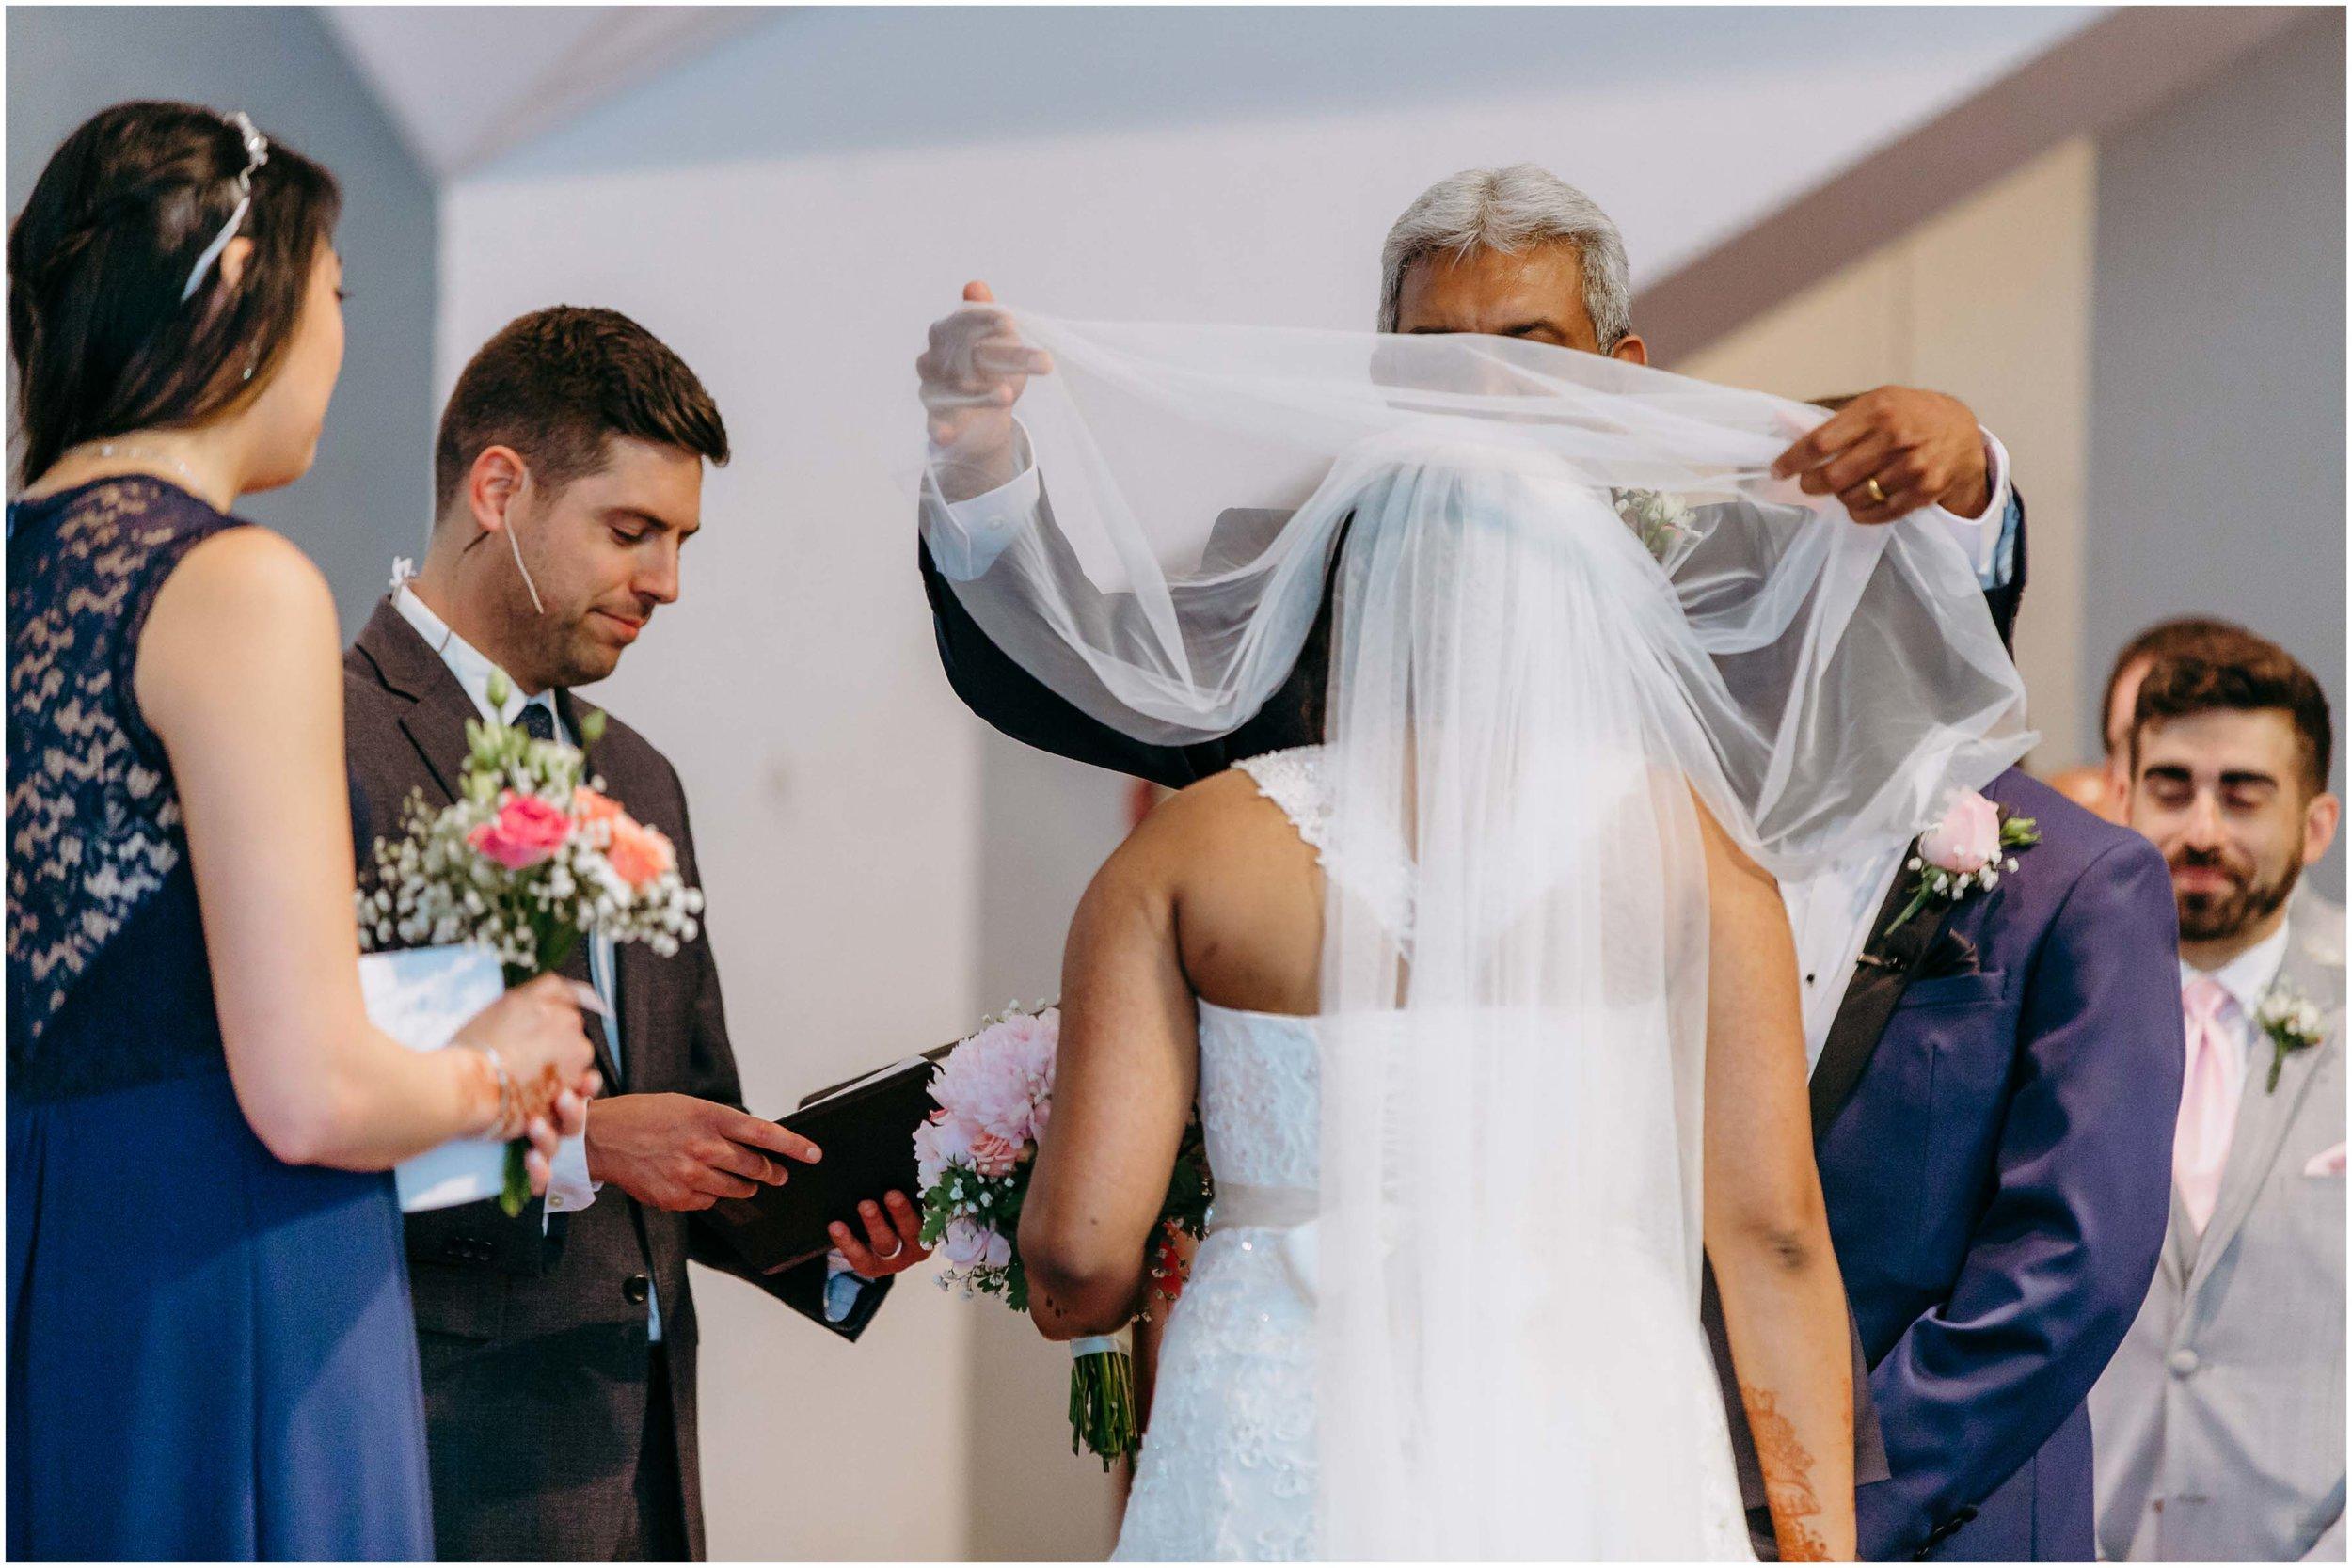 NH wedding photography, NH wedding photographer, wedding photographer NH, wedding photographers NH, wedding photography NH, bride and her father